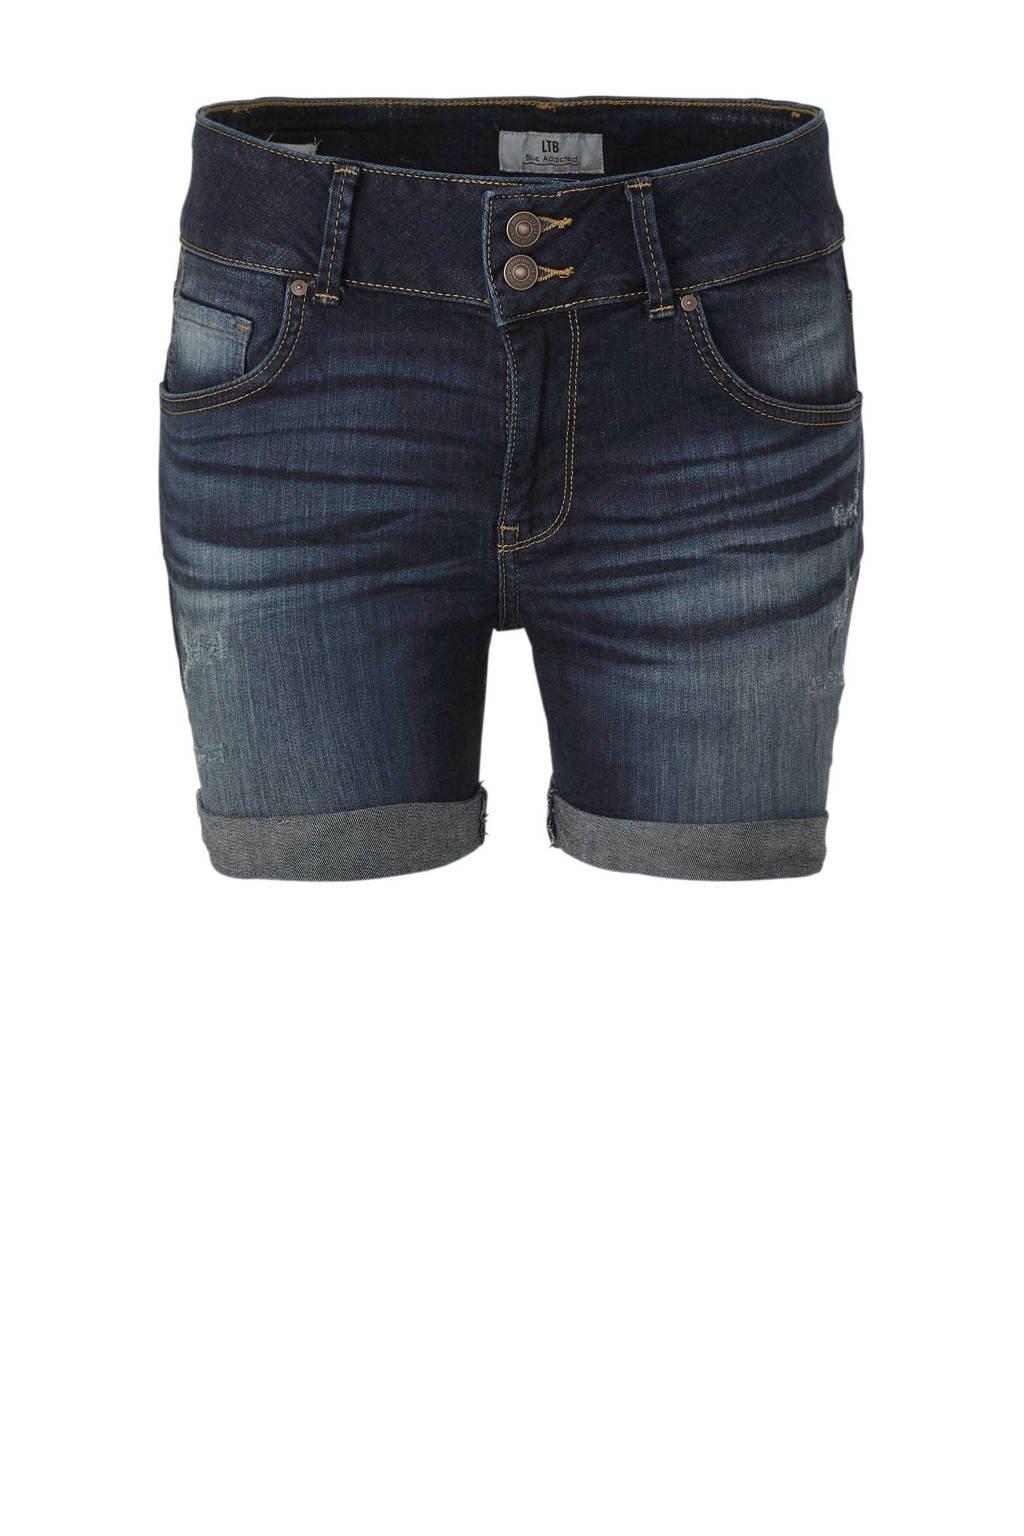 LTB Becky X jeans short donkerblauw, 51604 Lowri Wash.